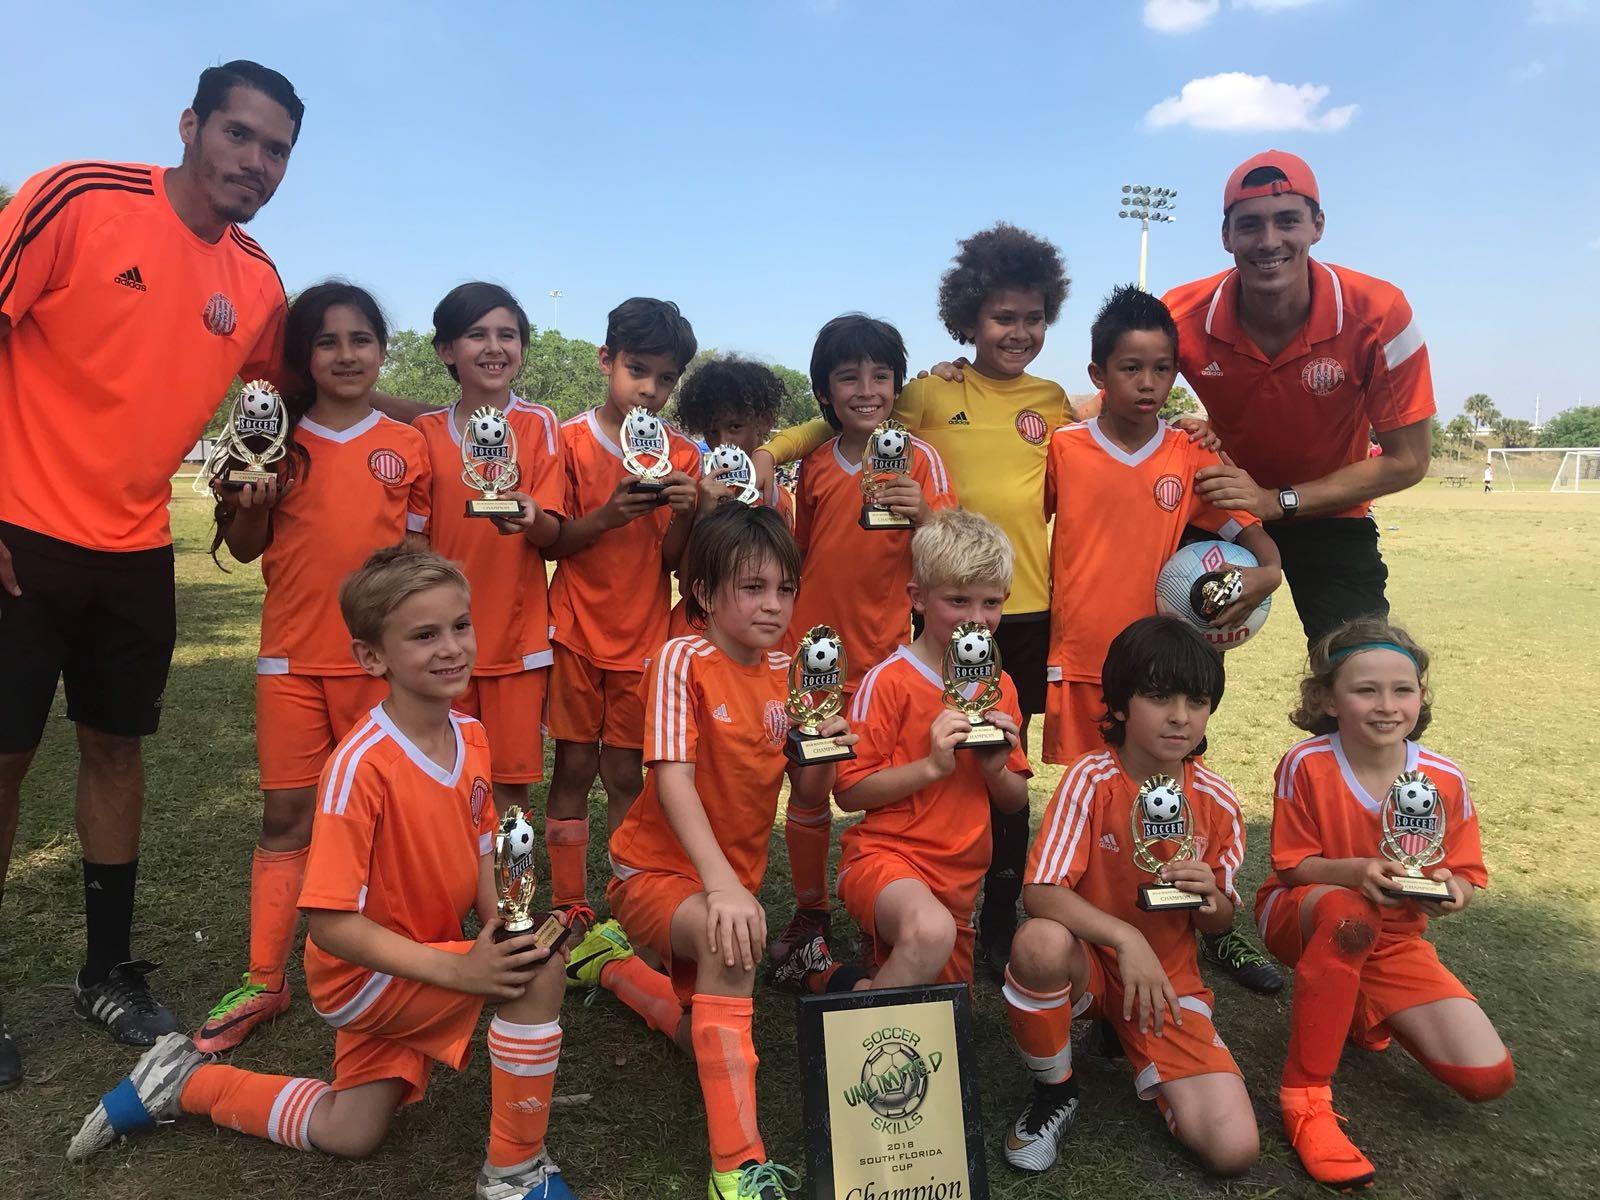 2009 Travel Team Athletic Club Miami